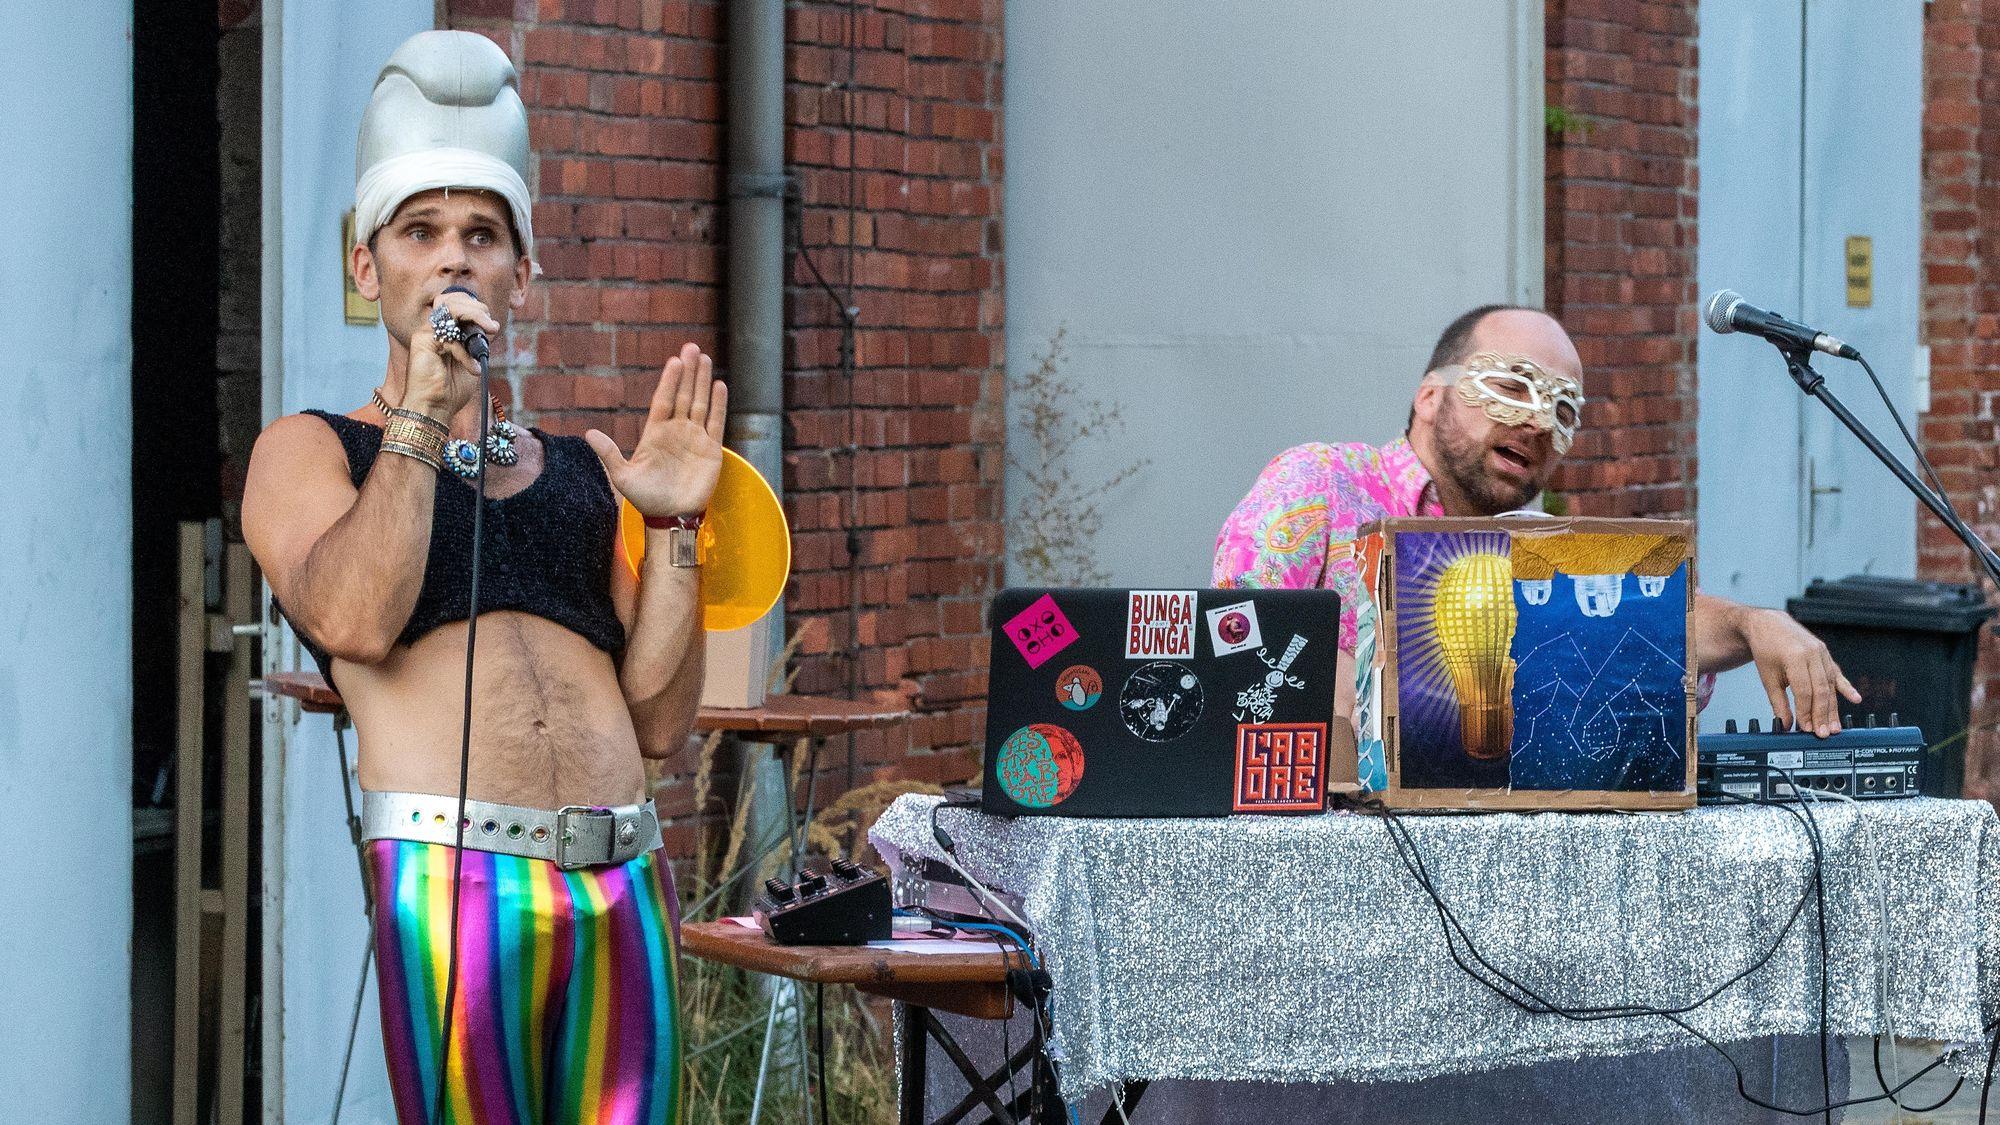 Oxo Oho - deutsches Elektropop-/Indietronic-Duo - Foto: Axel Lange